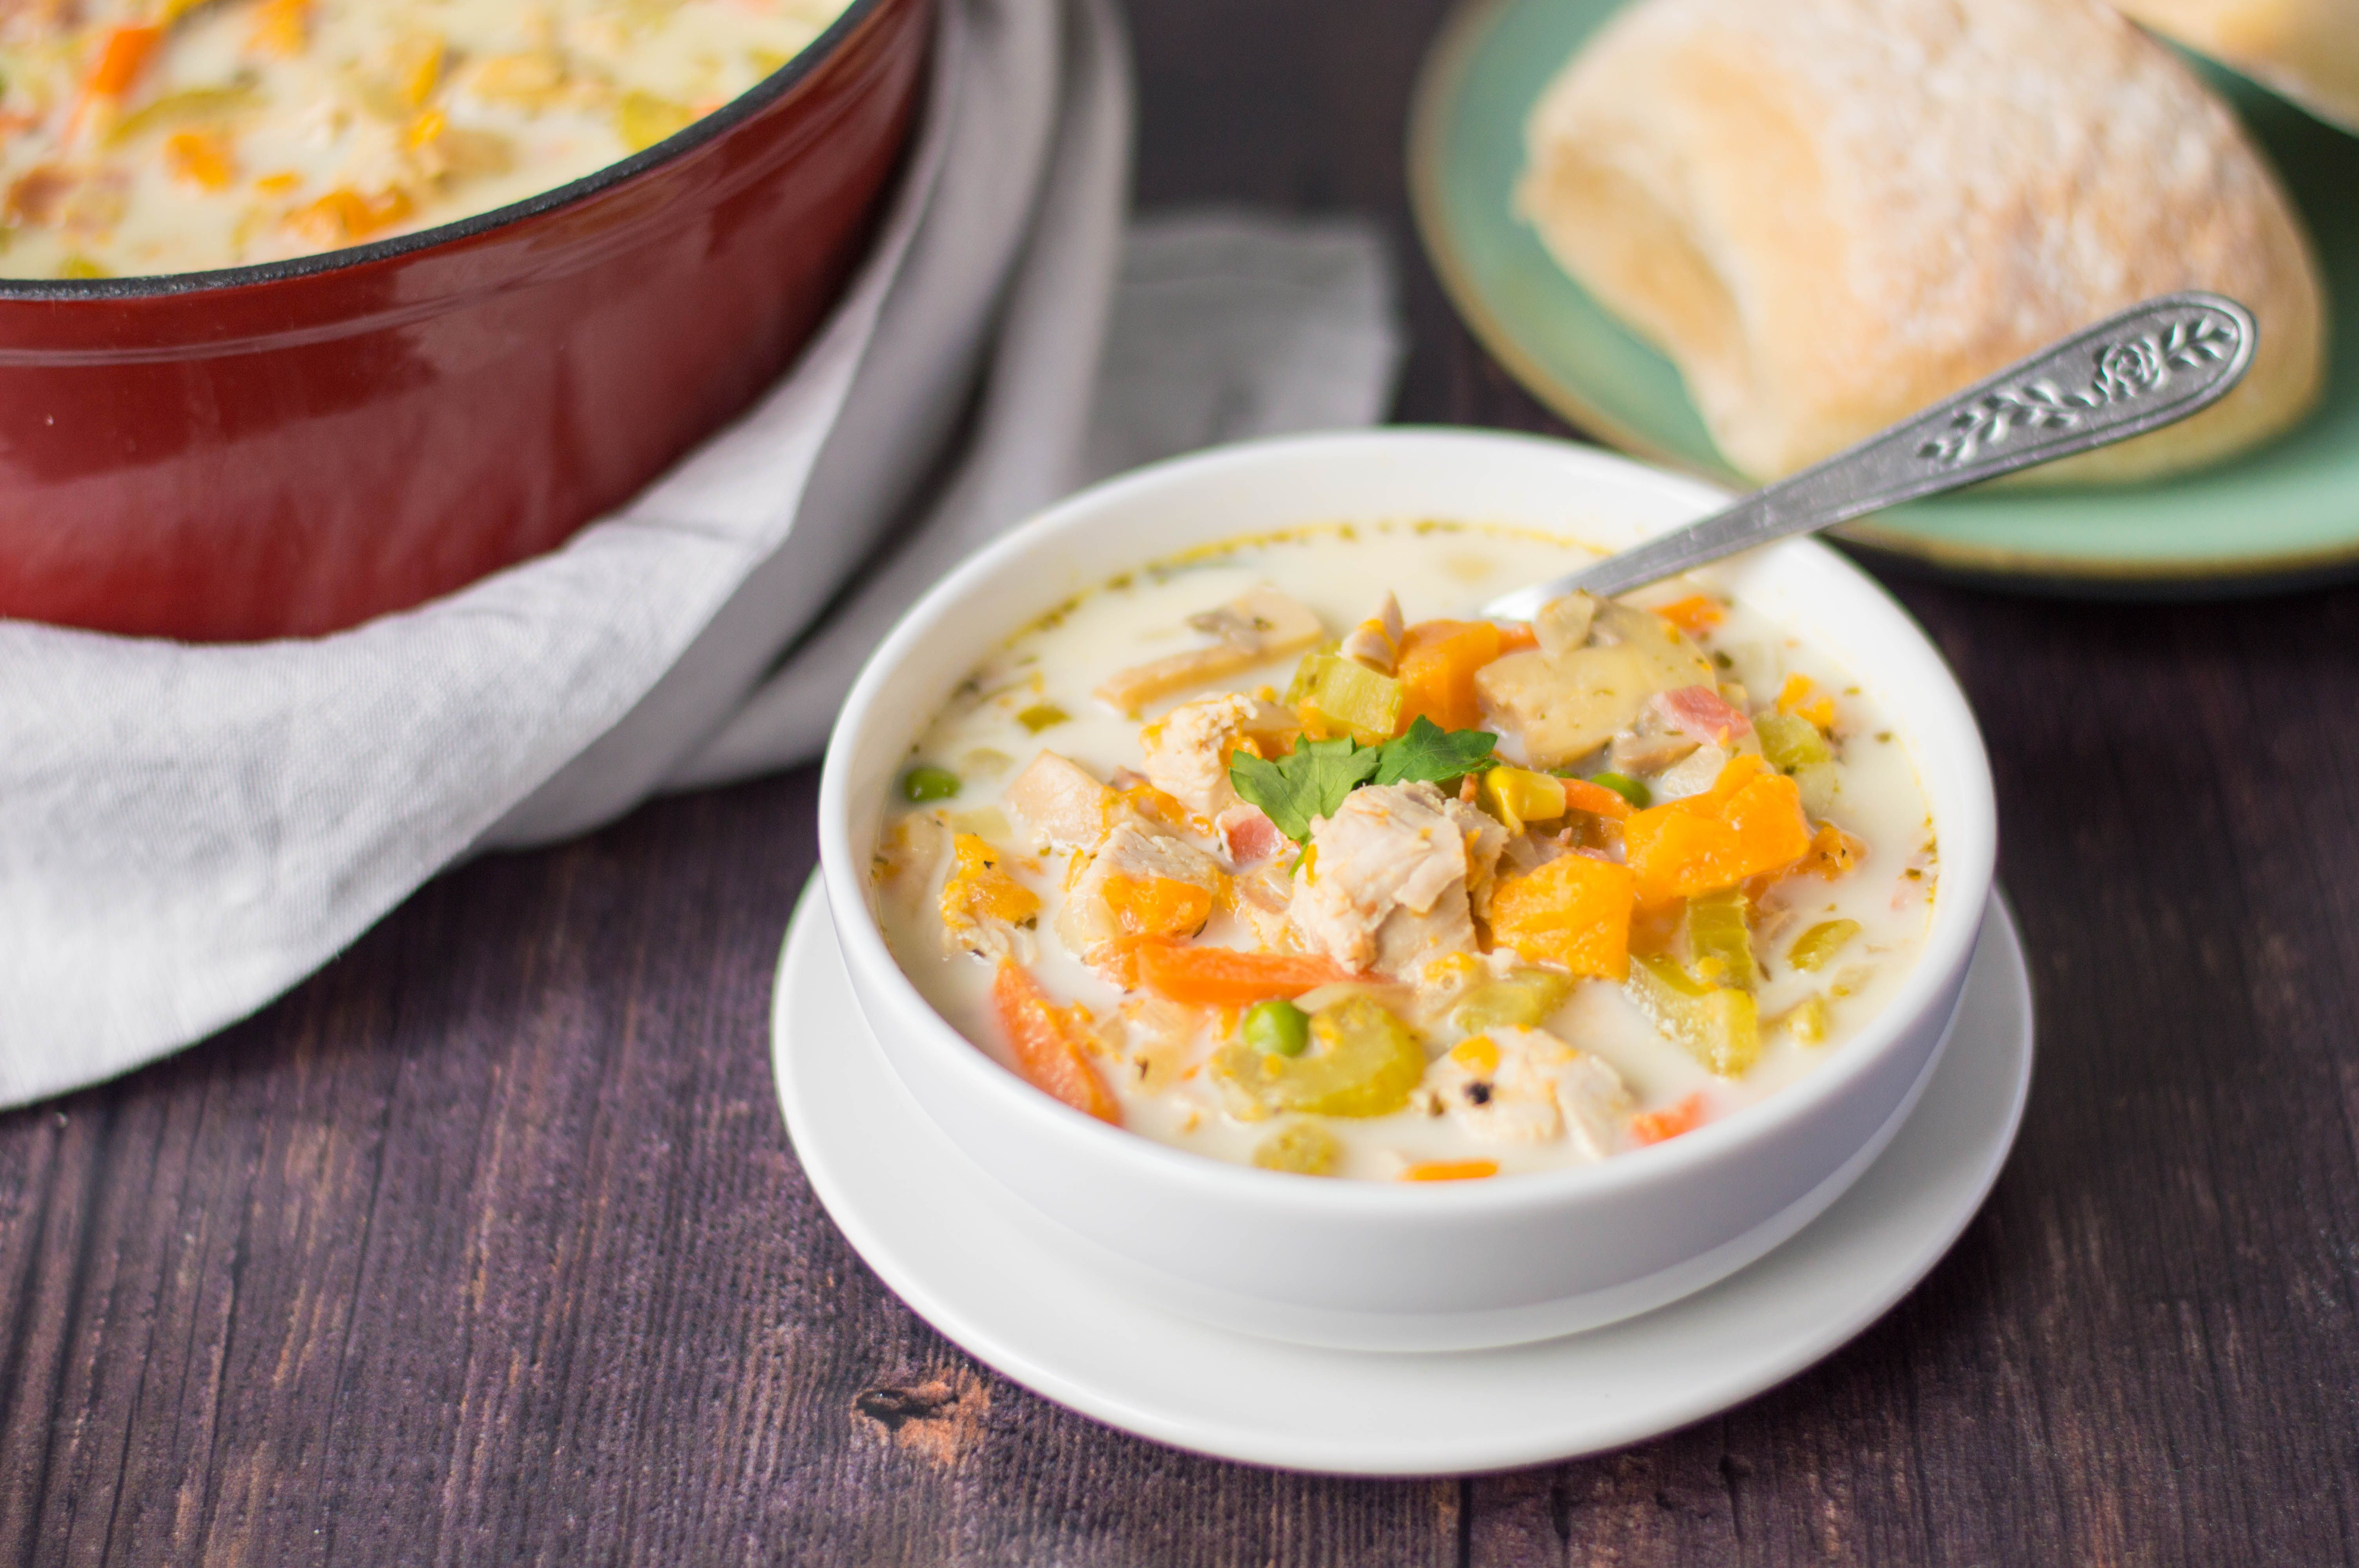 Turkey and sweet potato soup